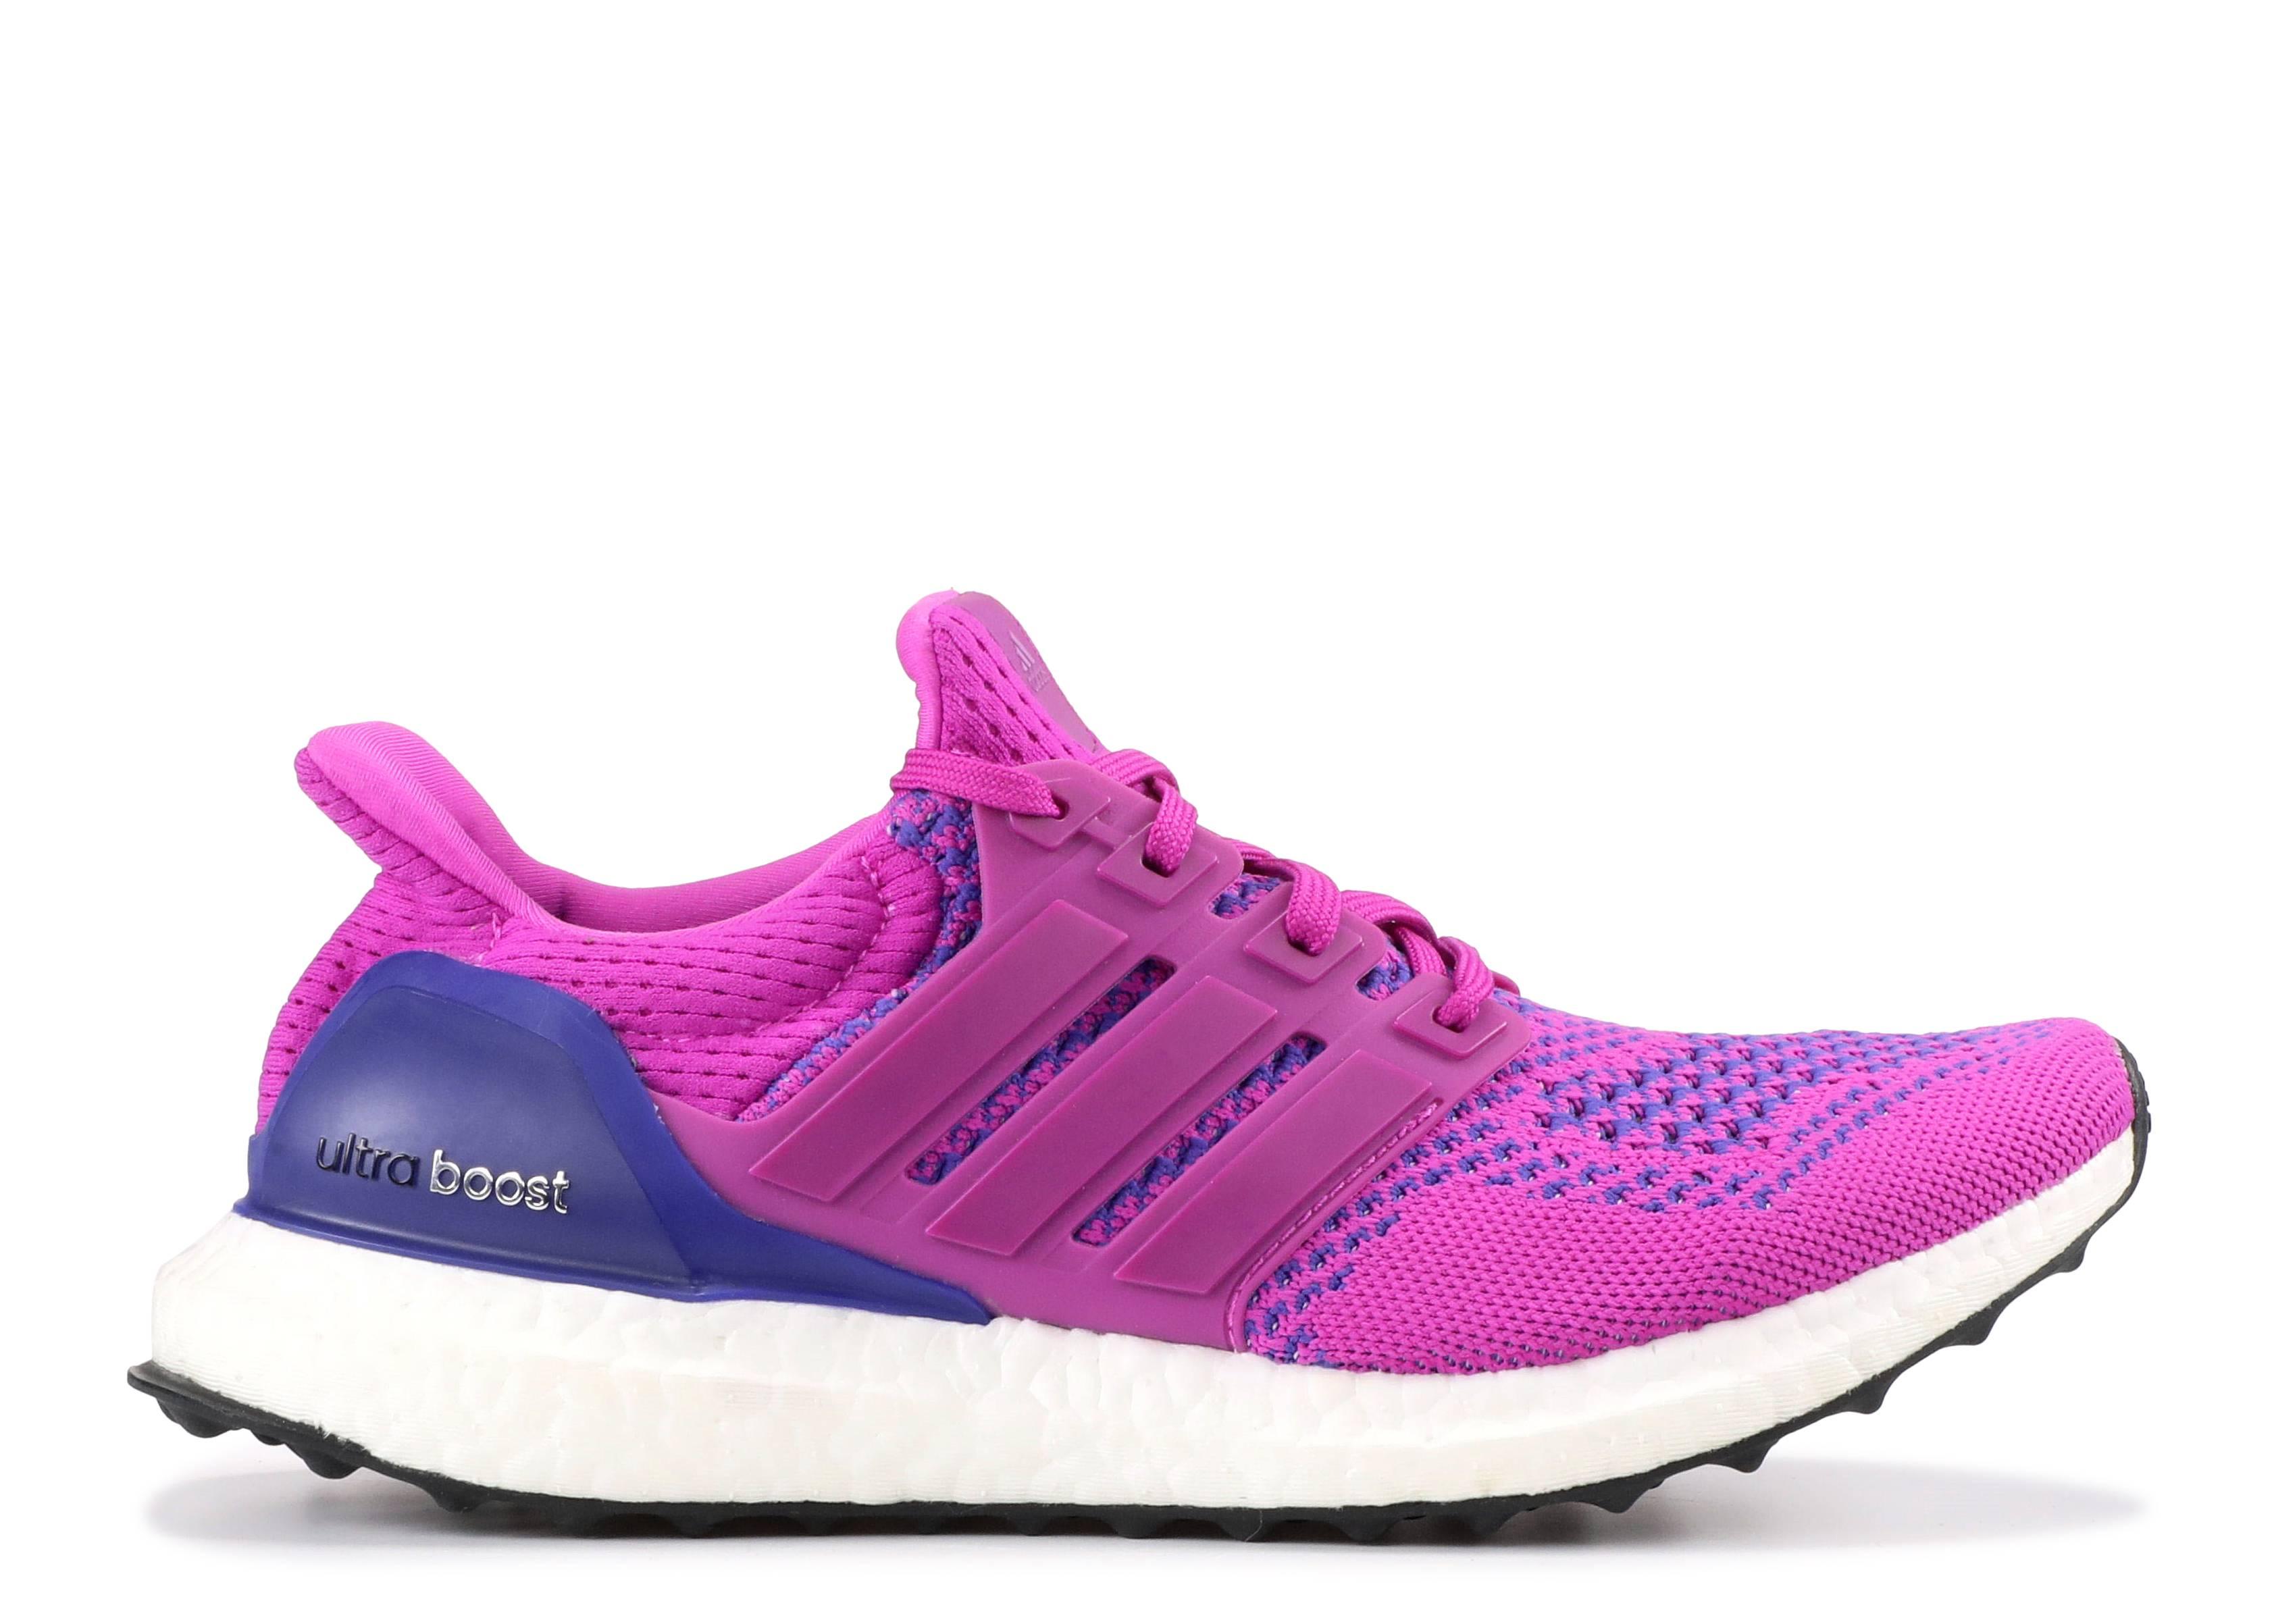 adidas ultra boost women's shoes flash pink/night flash